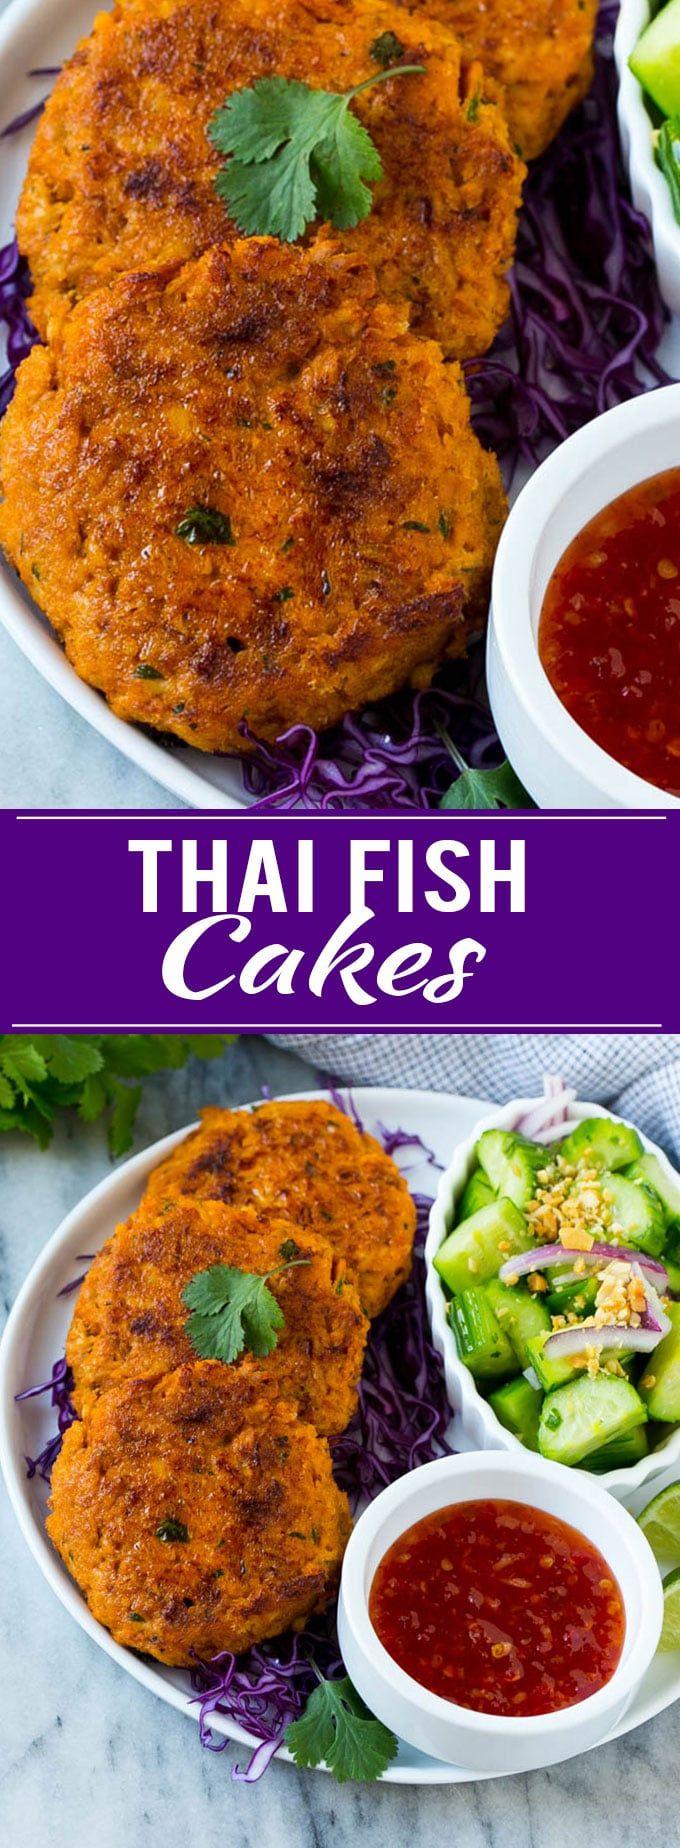 Thai Fish Cakes | Salmon Patties | Thai Food